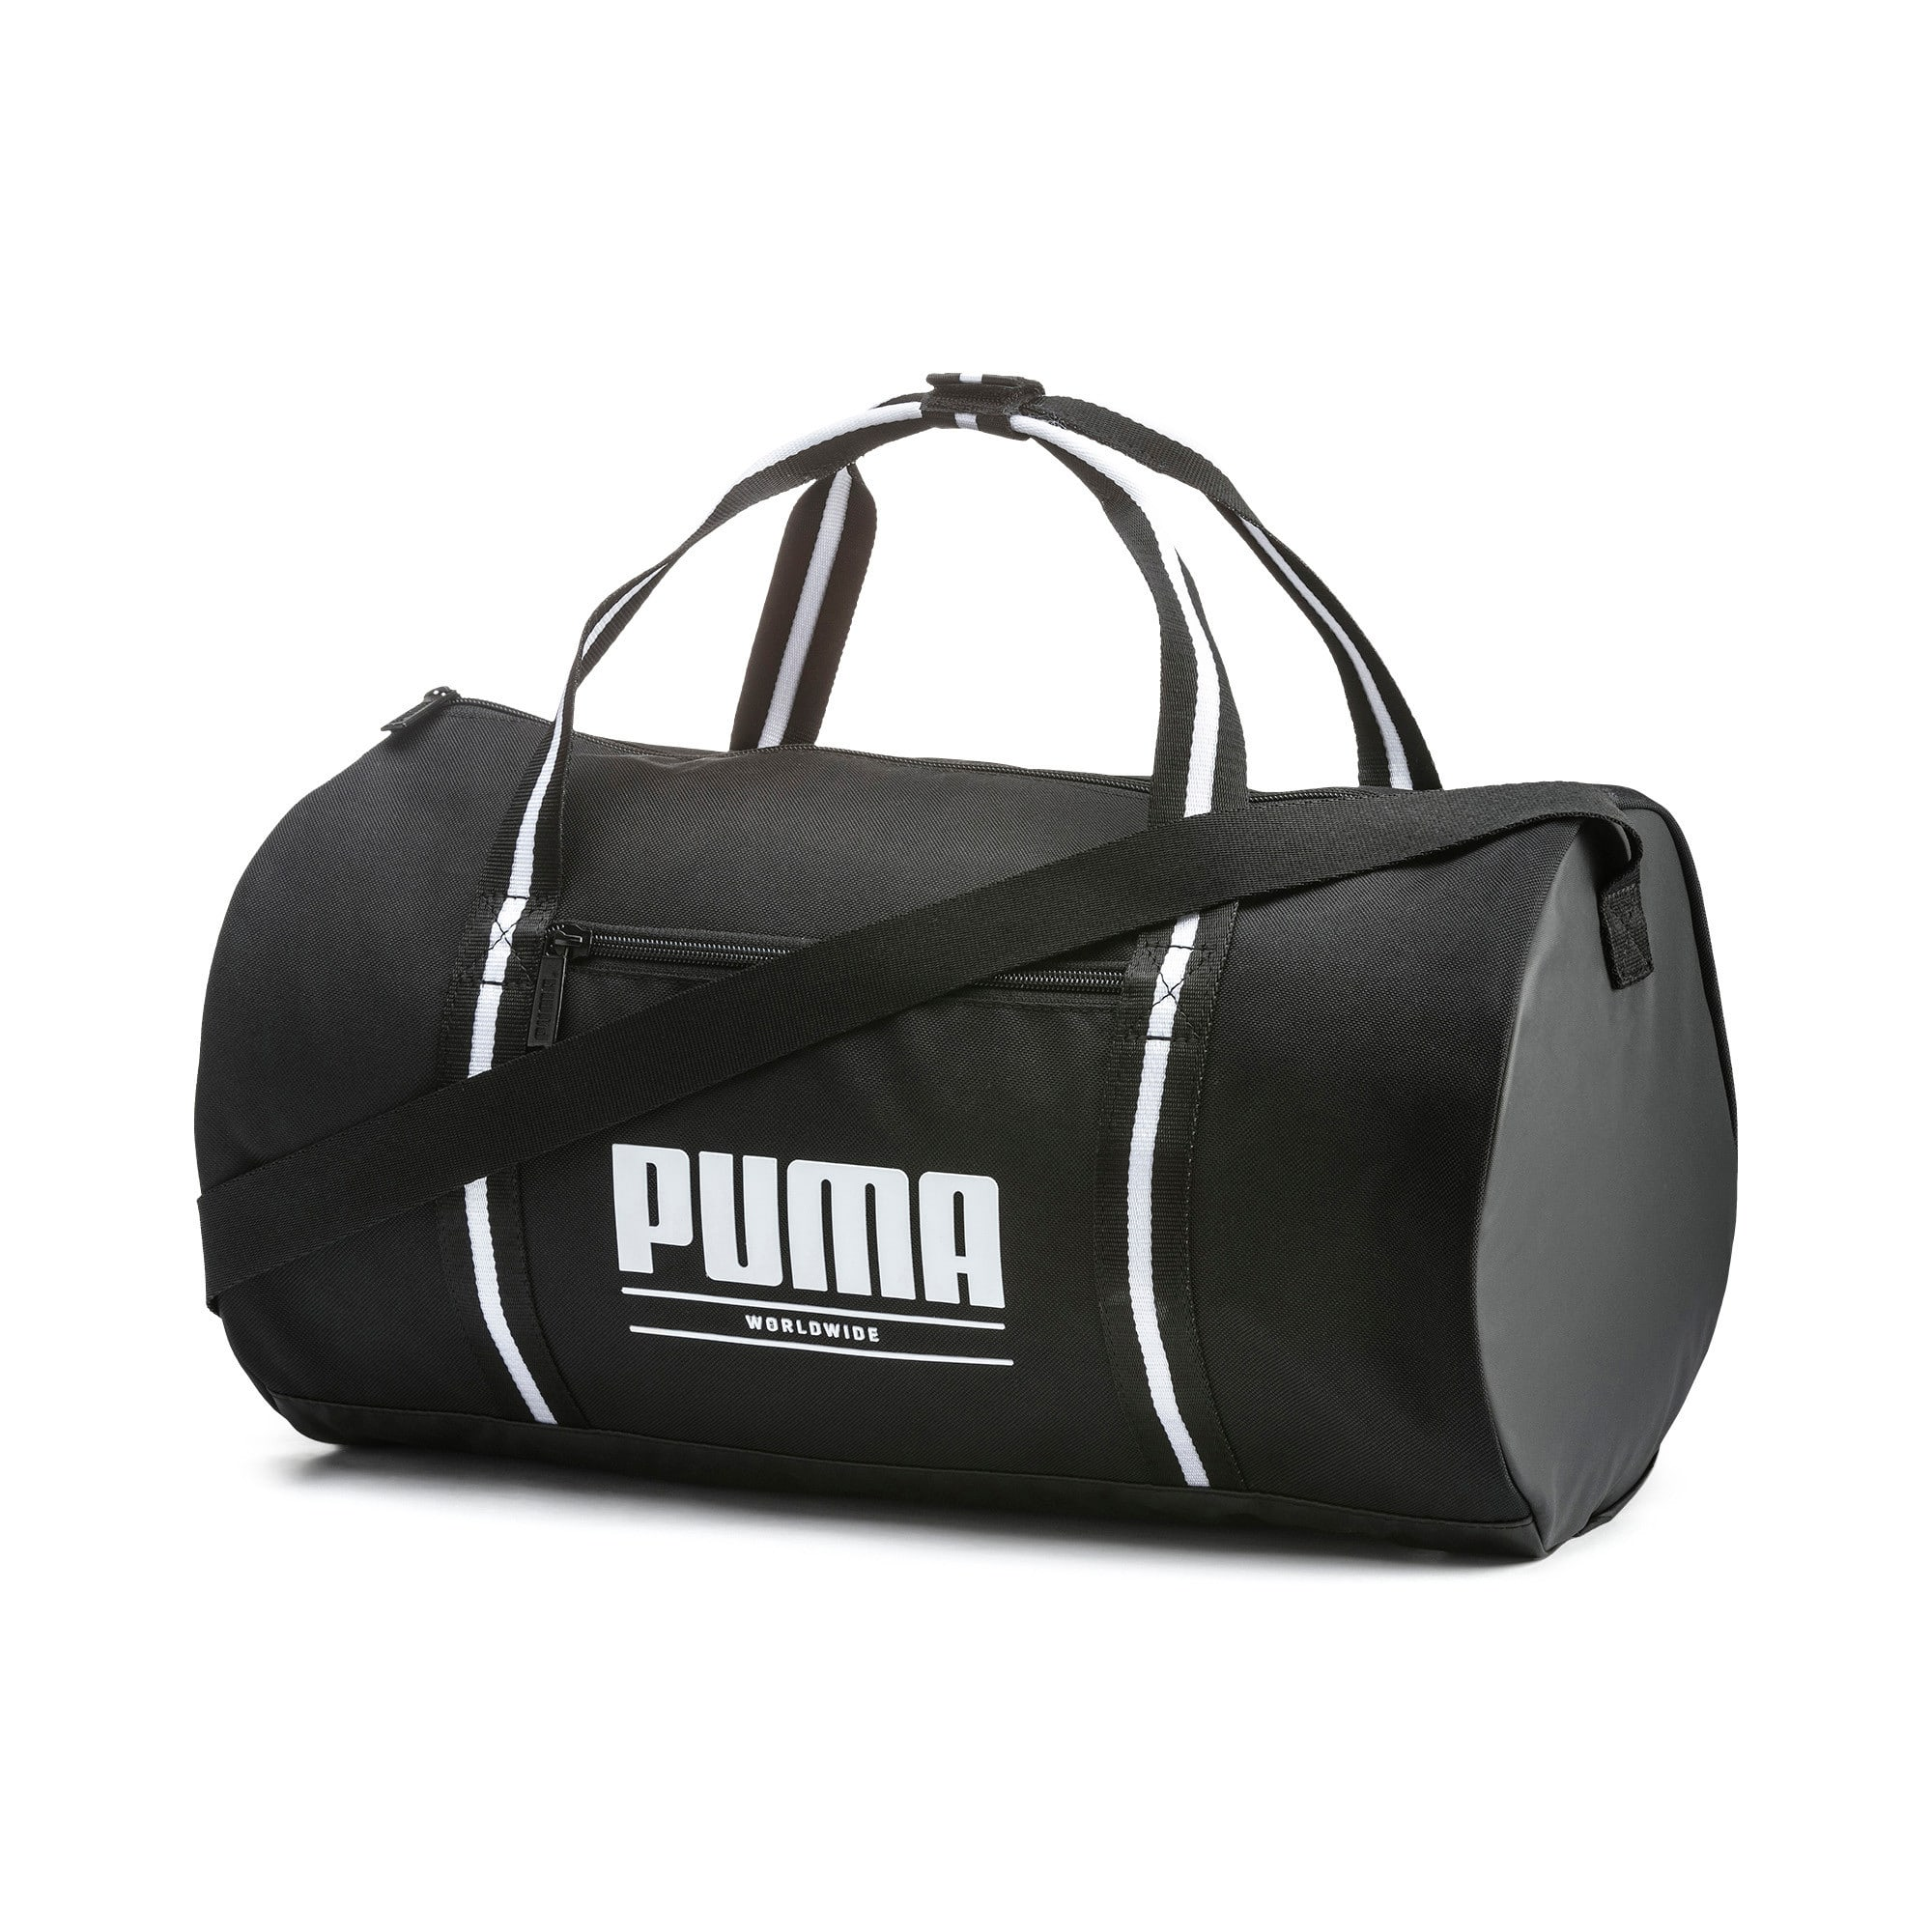 Thumbnail 1 of Base Women's Barrel Bag, Puma Black, medium-IND